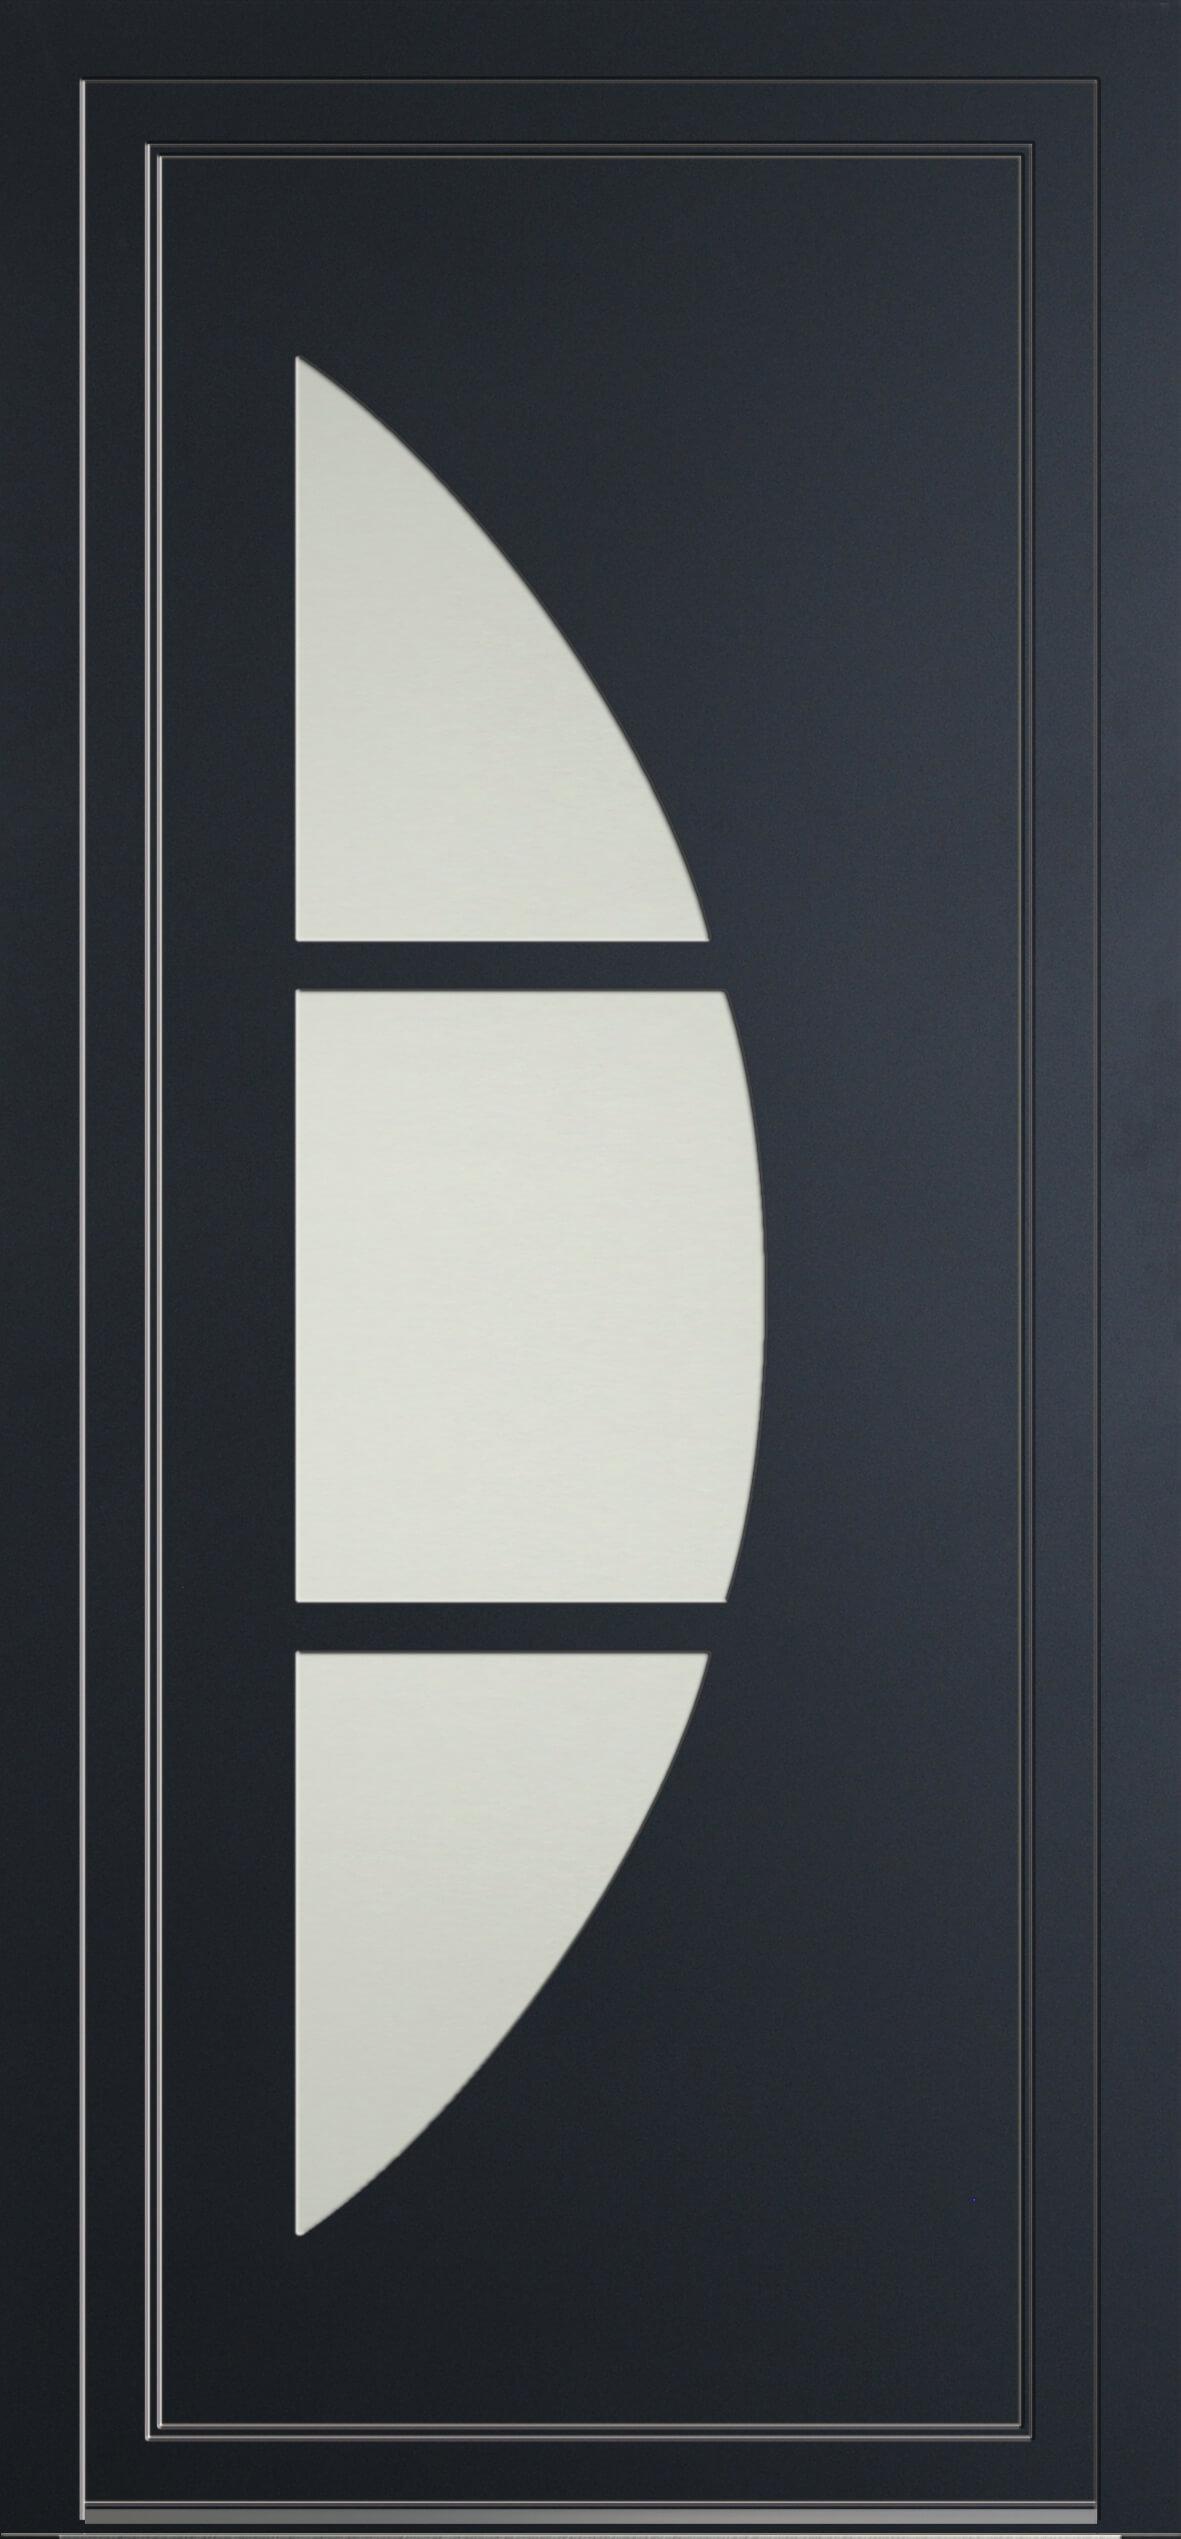 store banne prix discount 15 540 4 7016. Black Bedroom Furniture Sets. Home Design Ideas